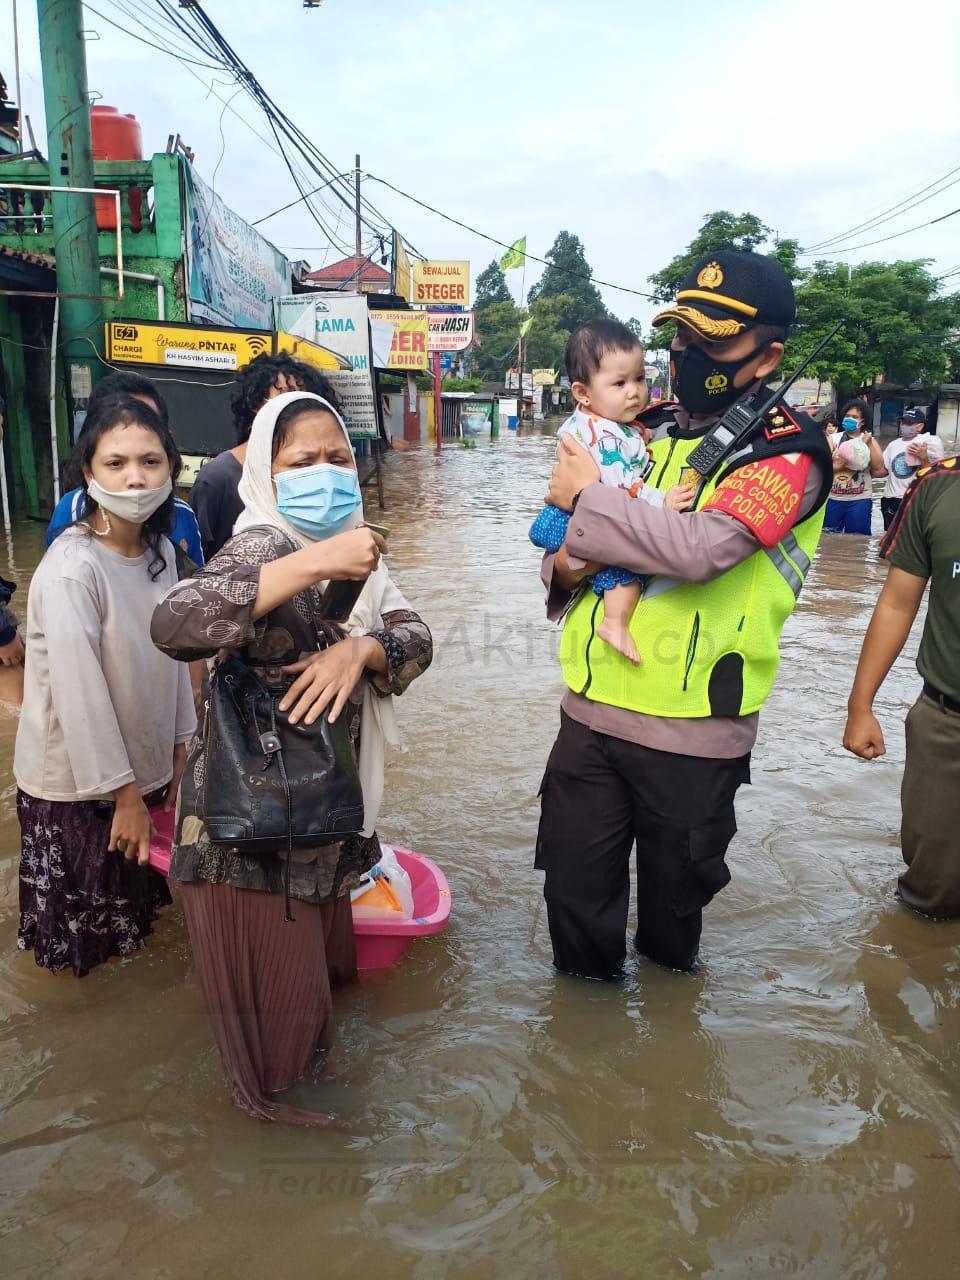 TNI-Polri Evakuasi Korban Banjir di Setiap Titik Wilayah DKI Jakarta 7 IMG 20210221 WA0037